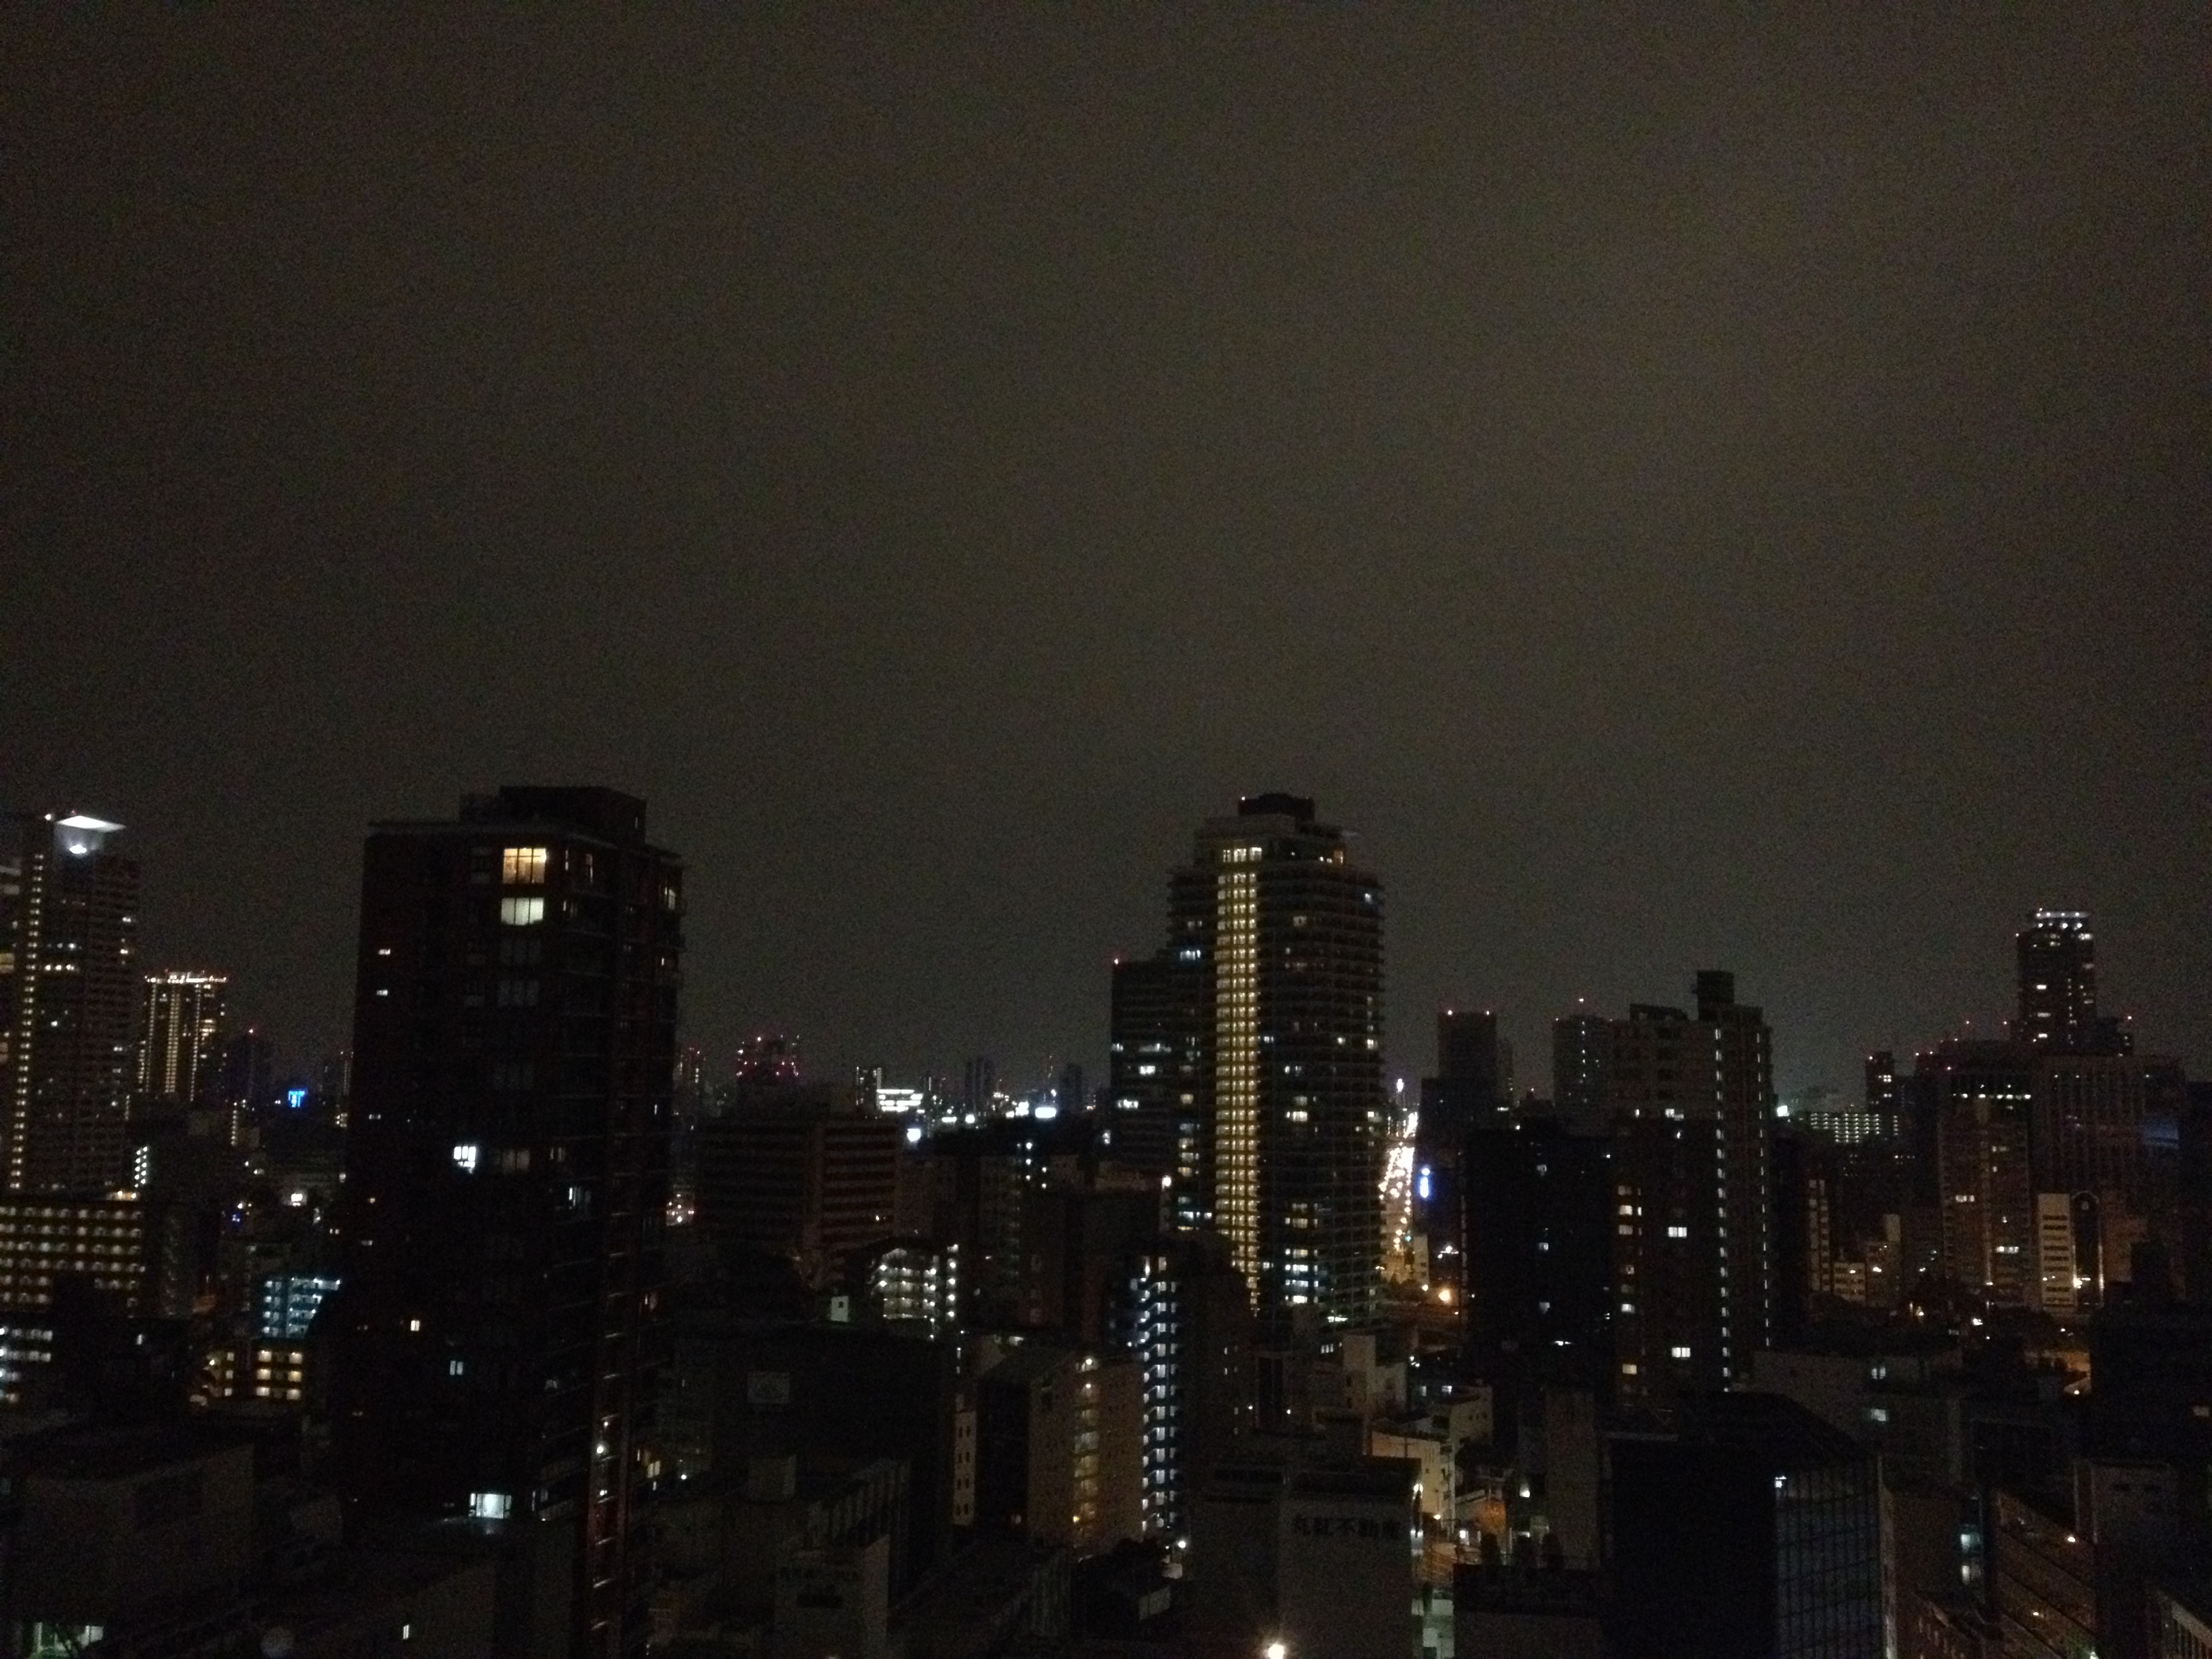 Osaka, Jan.1, 2012